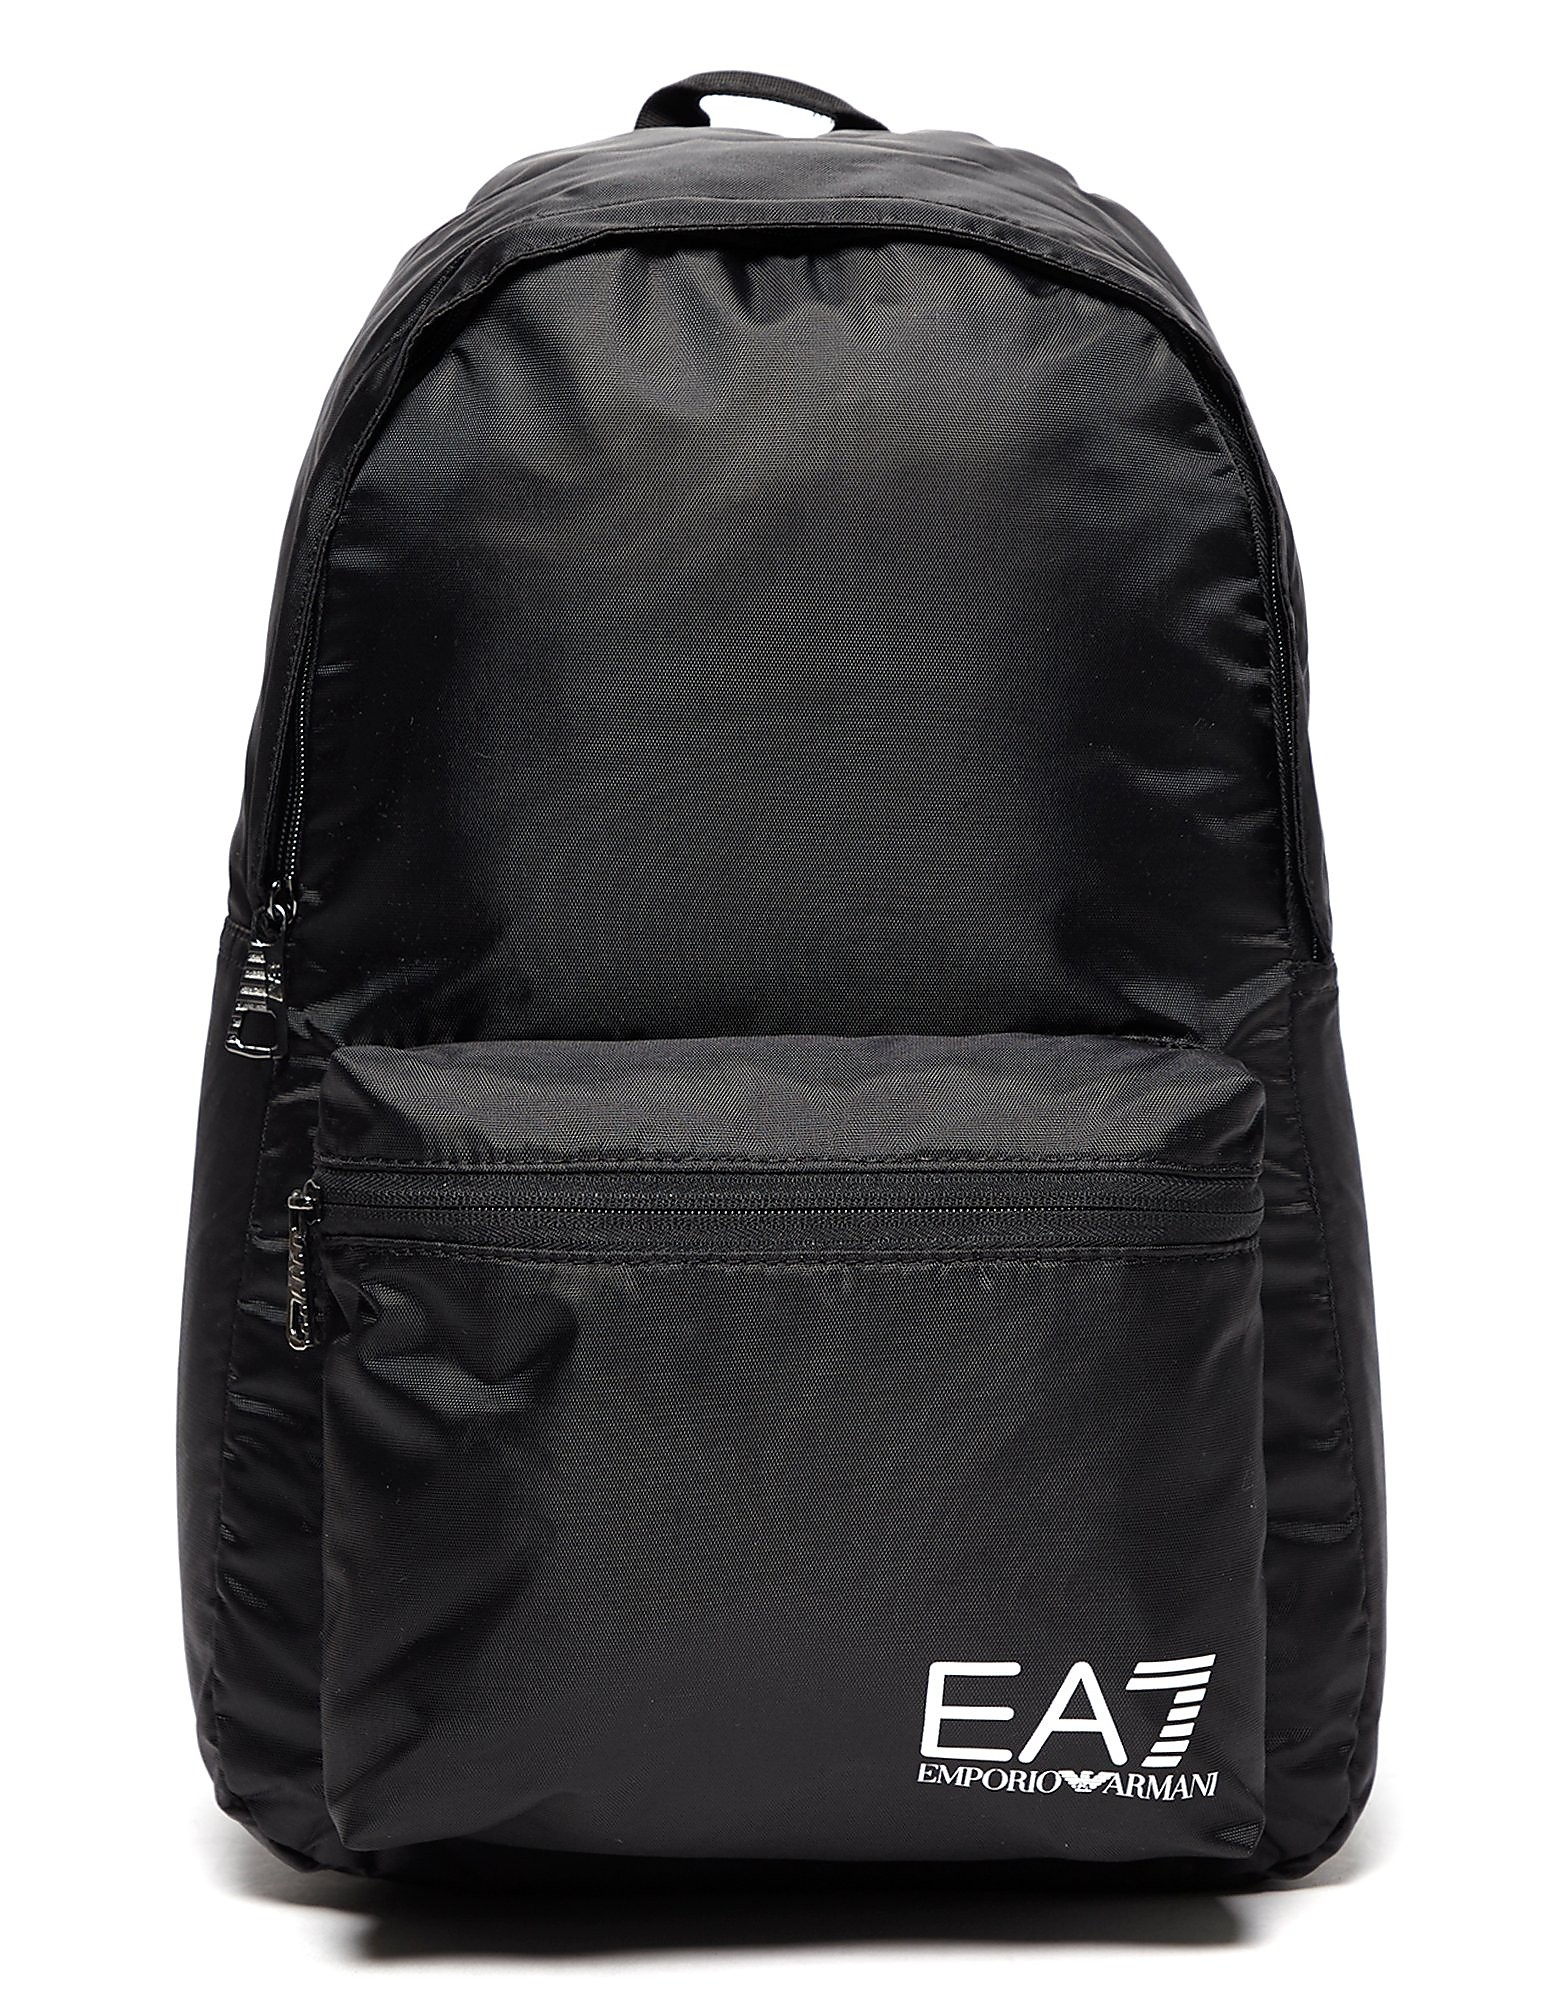 Emporio Armani EA7 Backpack